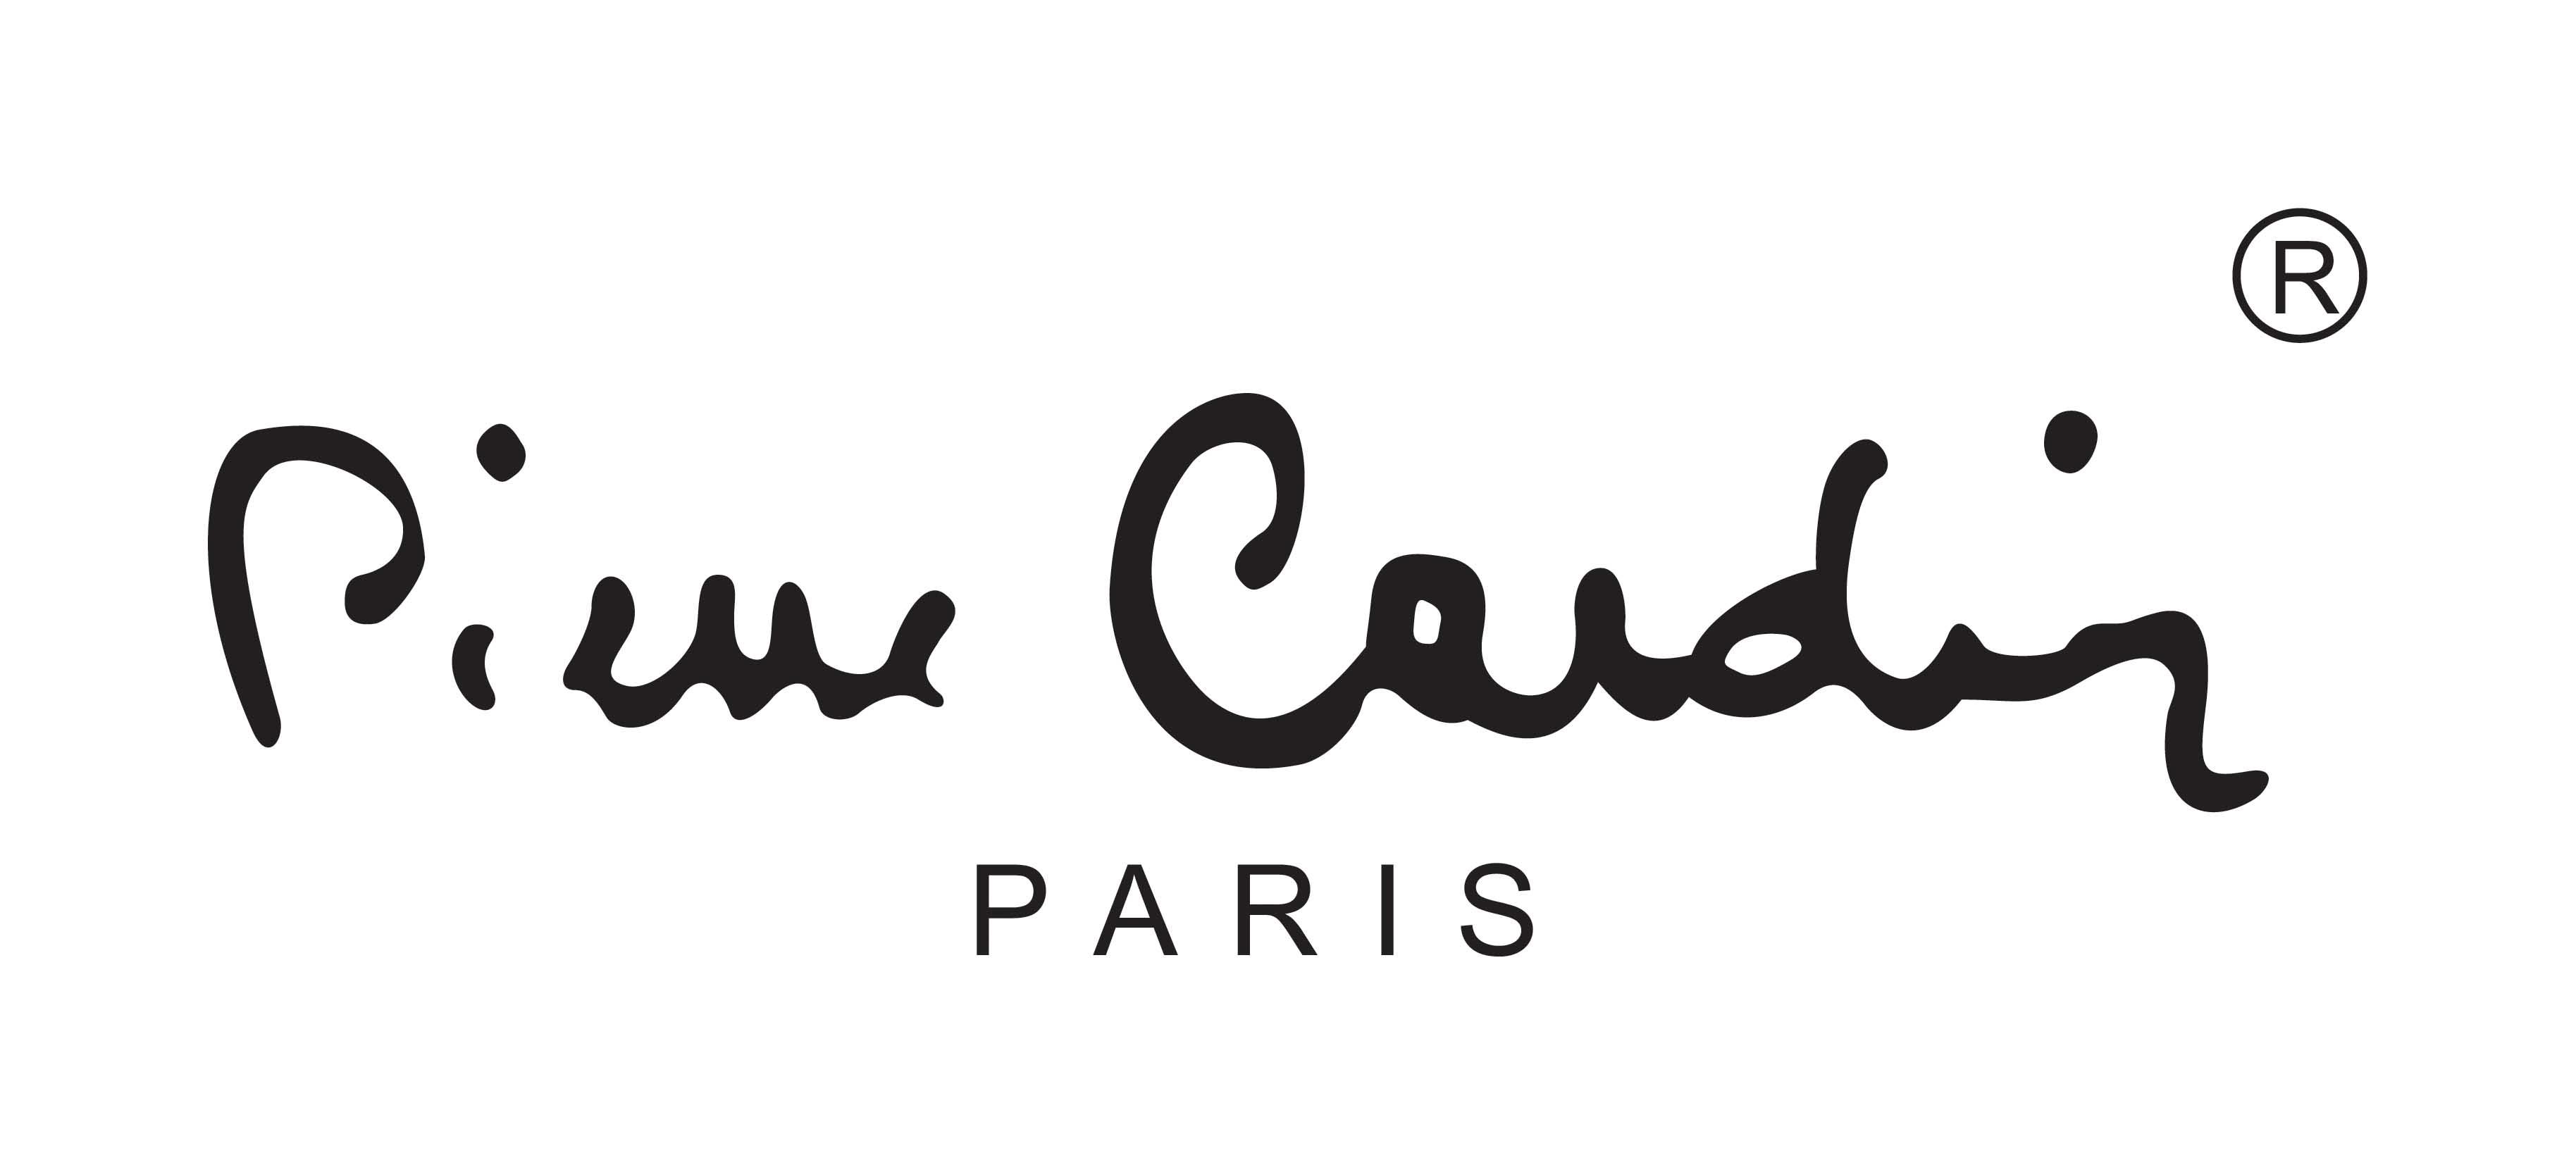 Pierre Cardin Designer Android Tablet Makes Official Debut